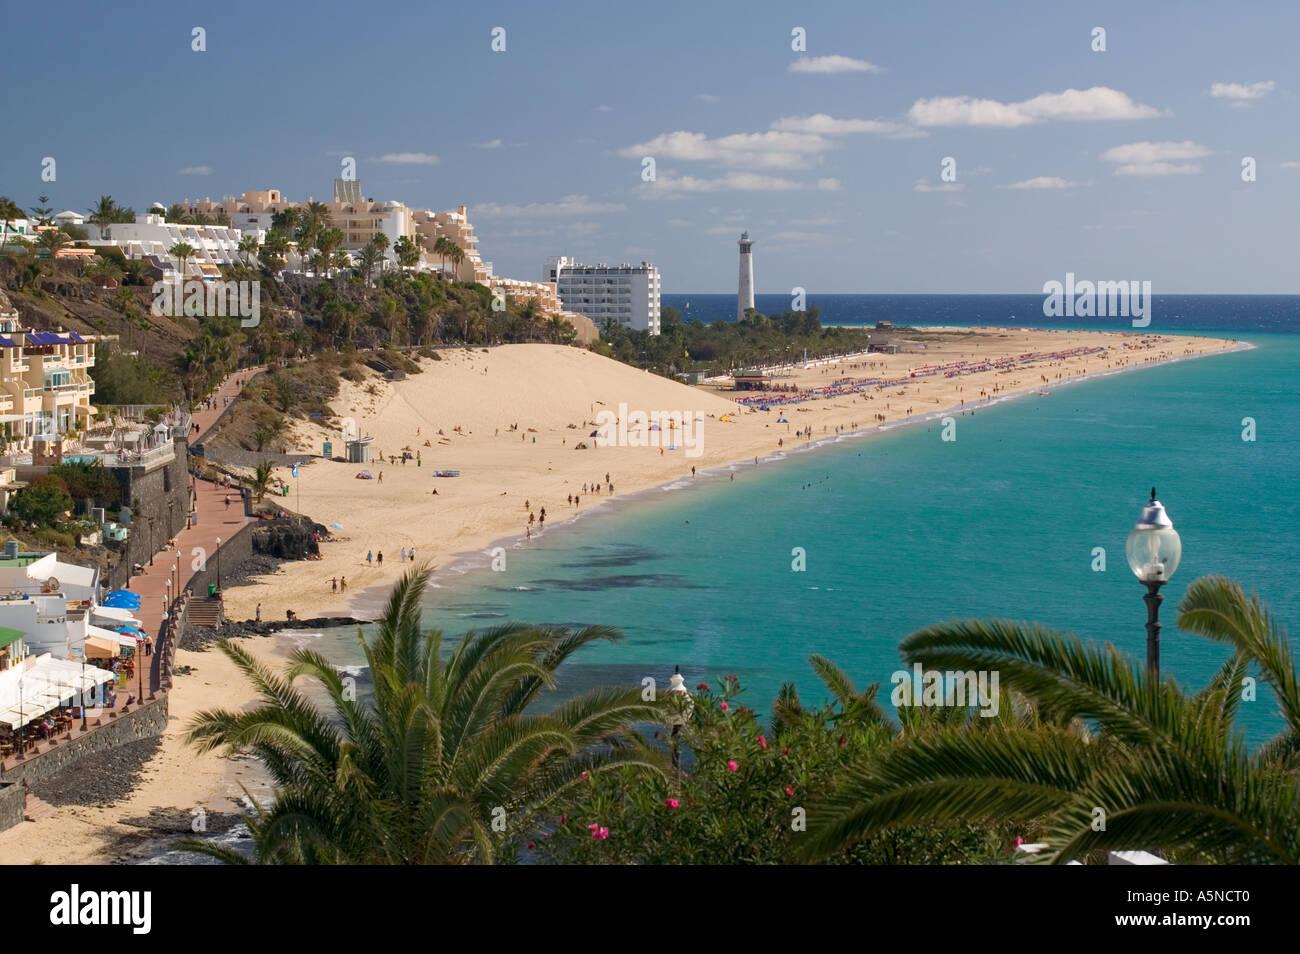 Playa De Sotavento De Jandia Morro Jable Fuerteventura Canary Islands Stock Photo Royalty Free